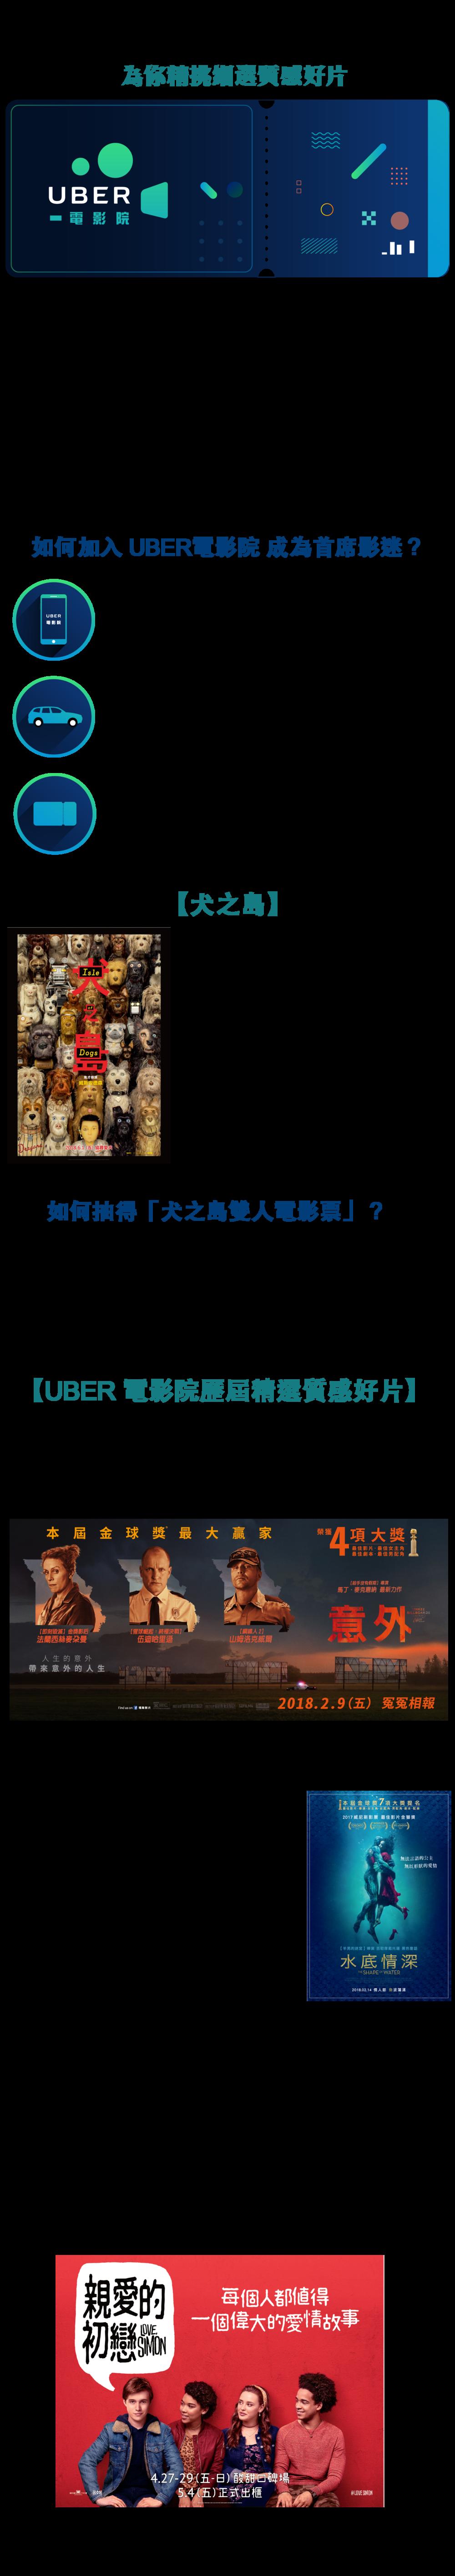 犬之島Landing page_工作區域 1.png